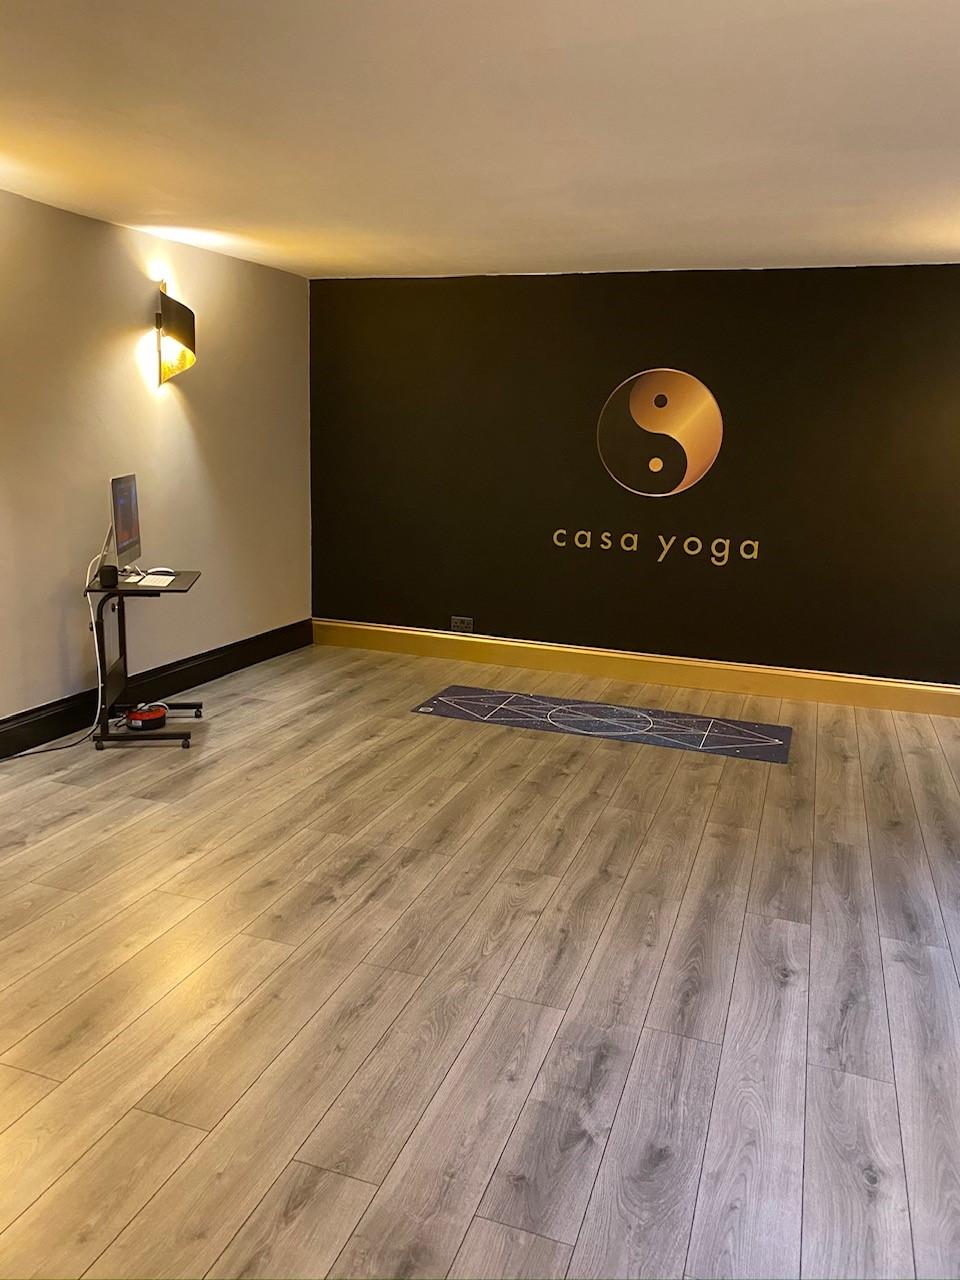 Casa Yoga studio room with a large ying yang logo on a dark wall